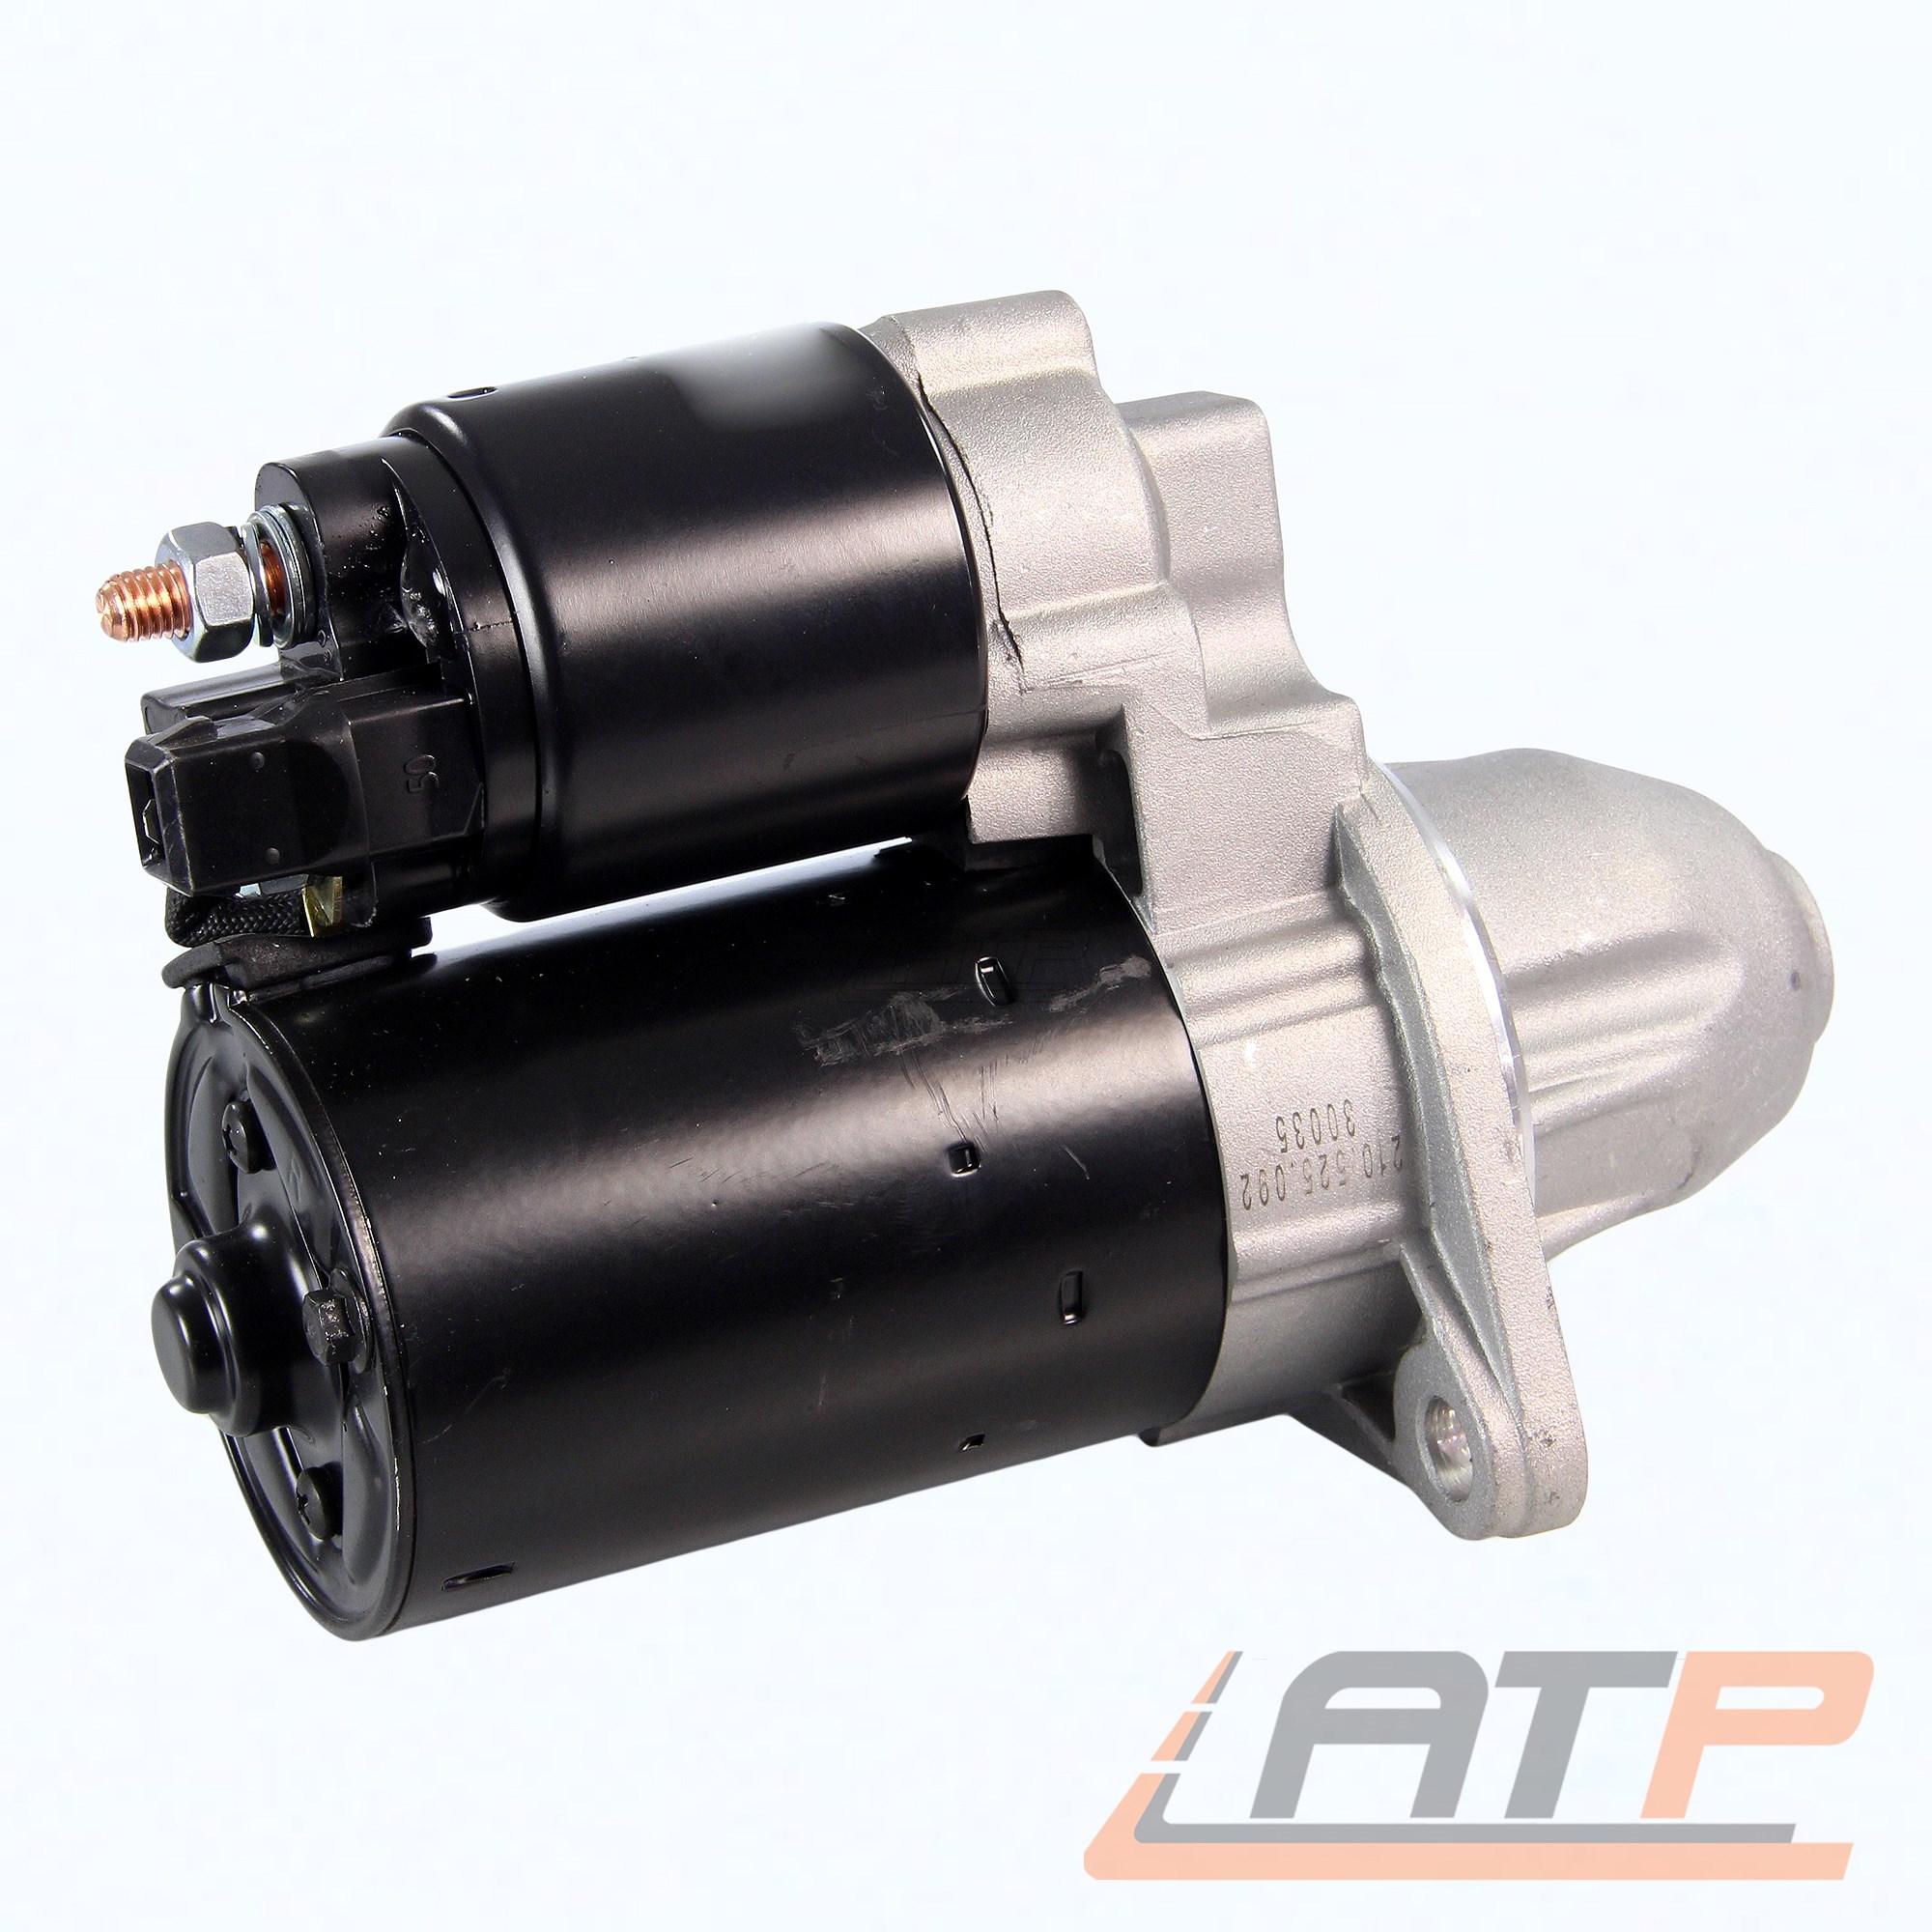 STARTER ANLASSER 1,2 KW BMW 3-ER E90 E91 E92 E93 316-335